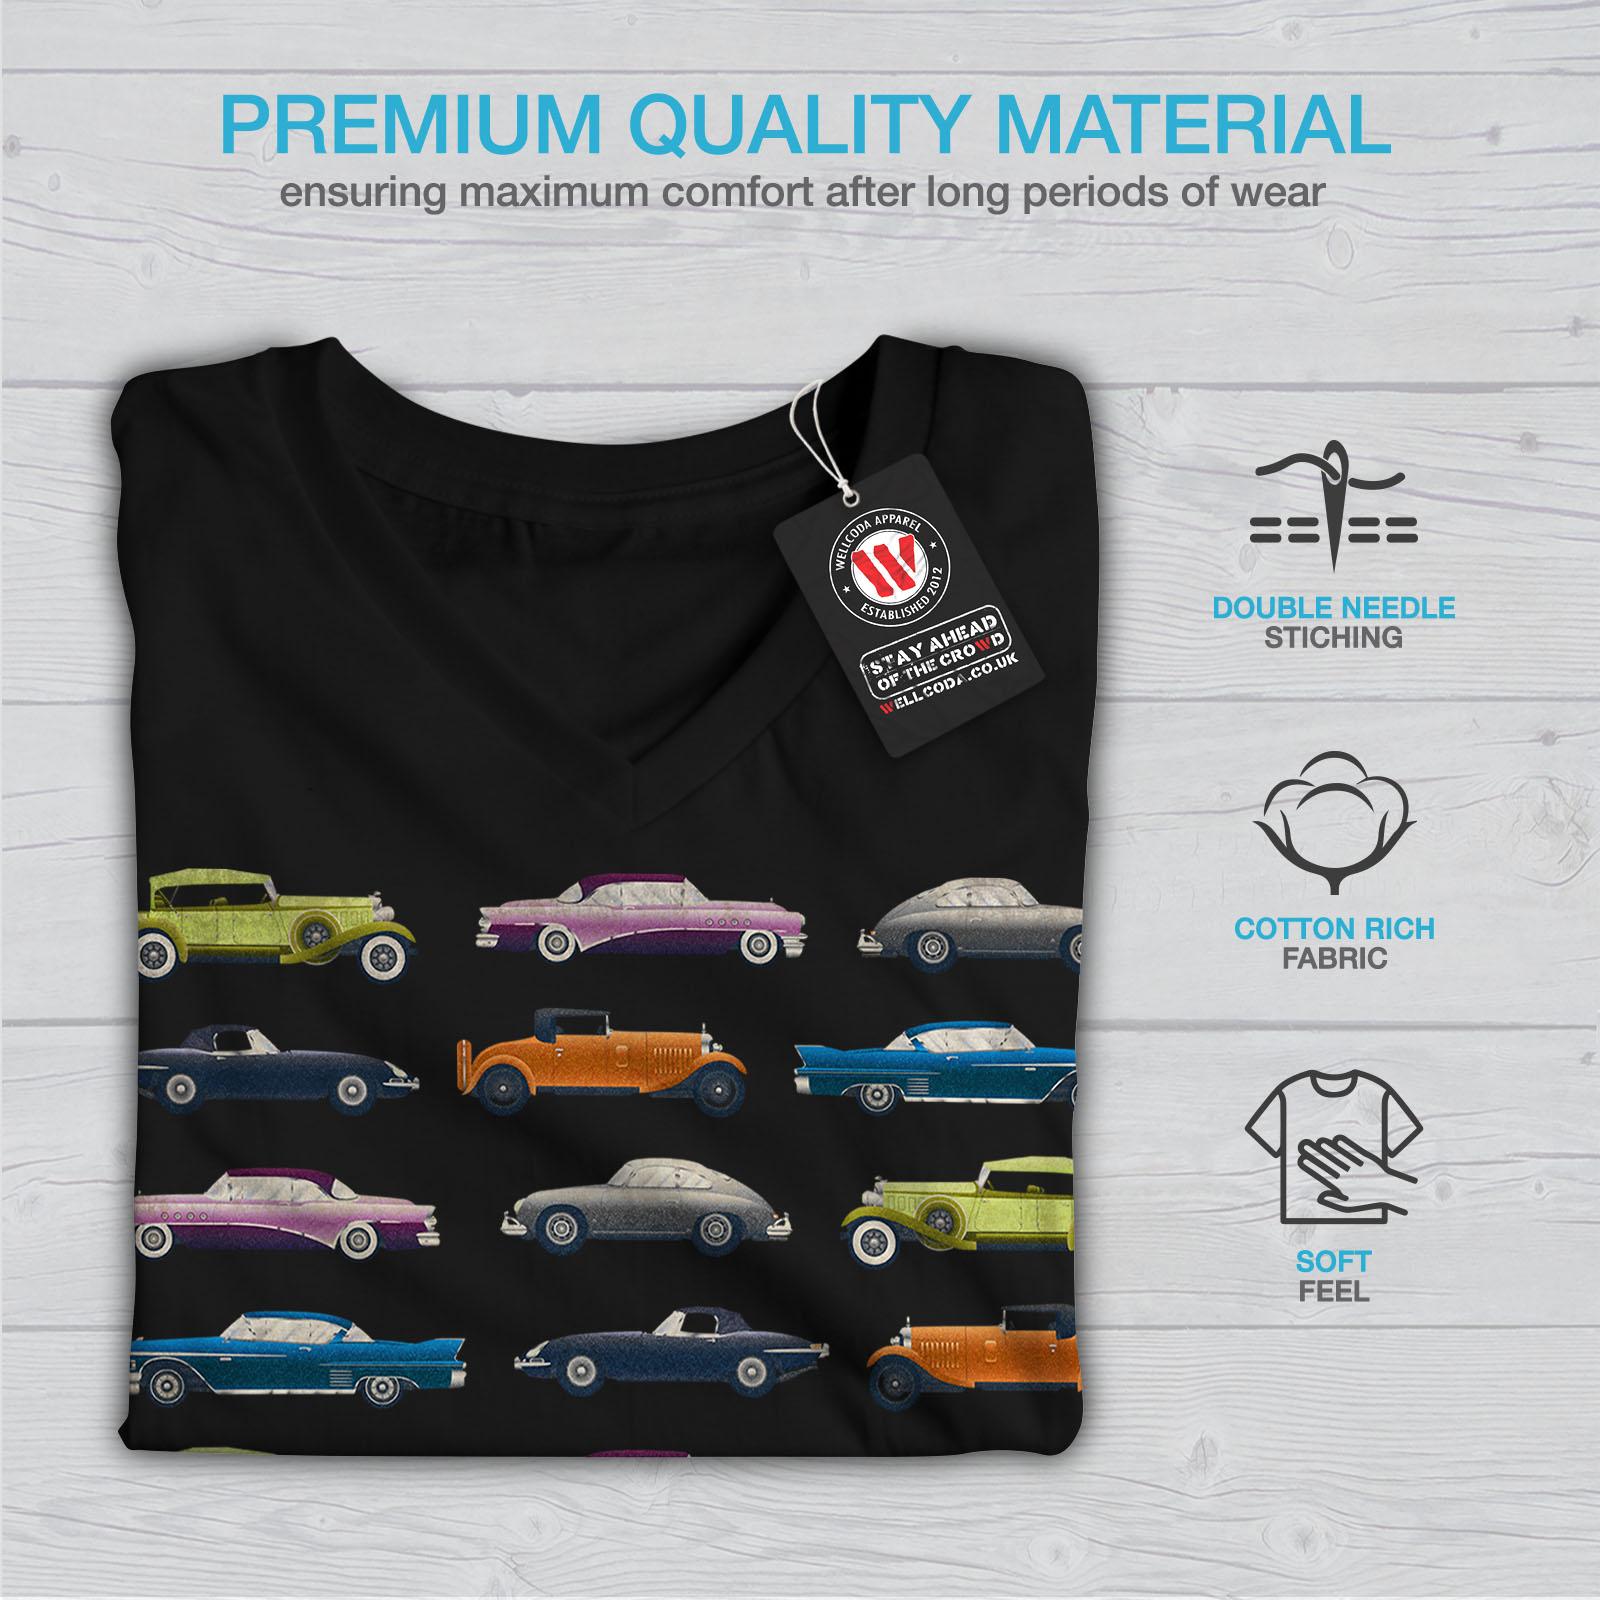 Wellcoda-Classic-Old-Pattern-Car-Womens-V-Neck-T-shirt-Retro-Graphic-Design-Tee thumbnail 5